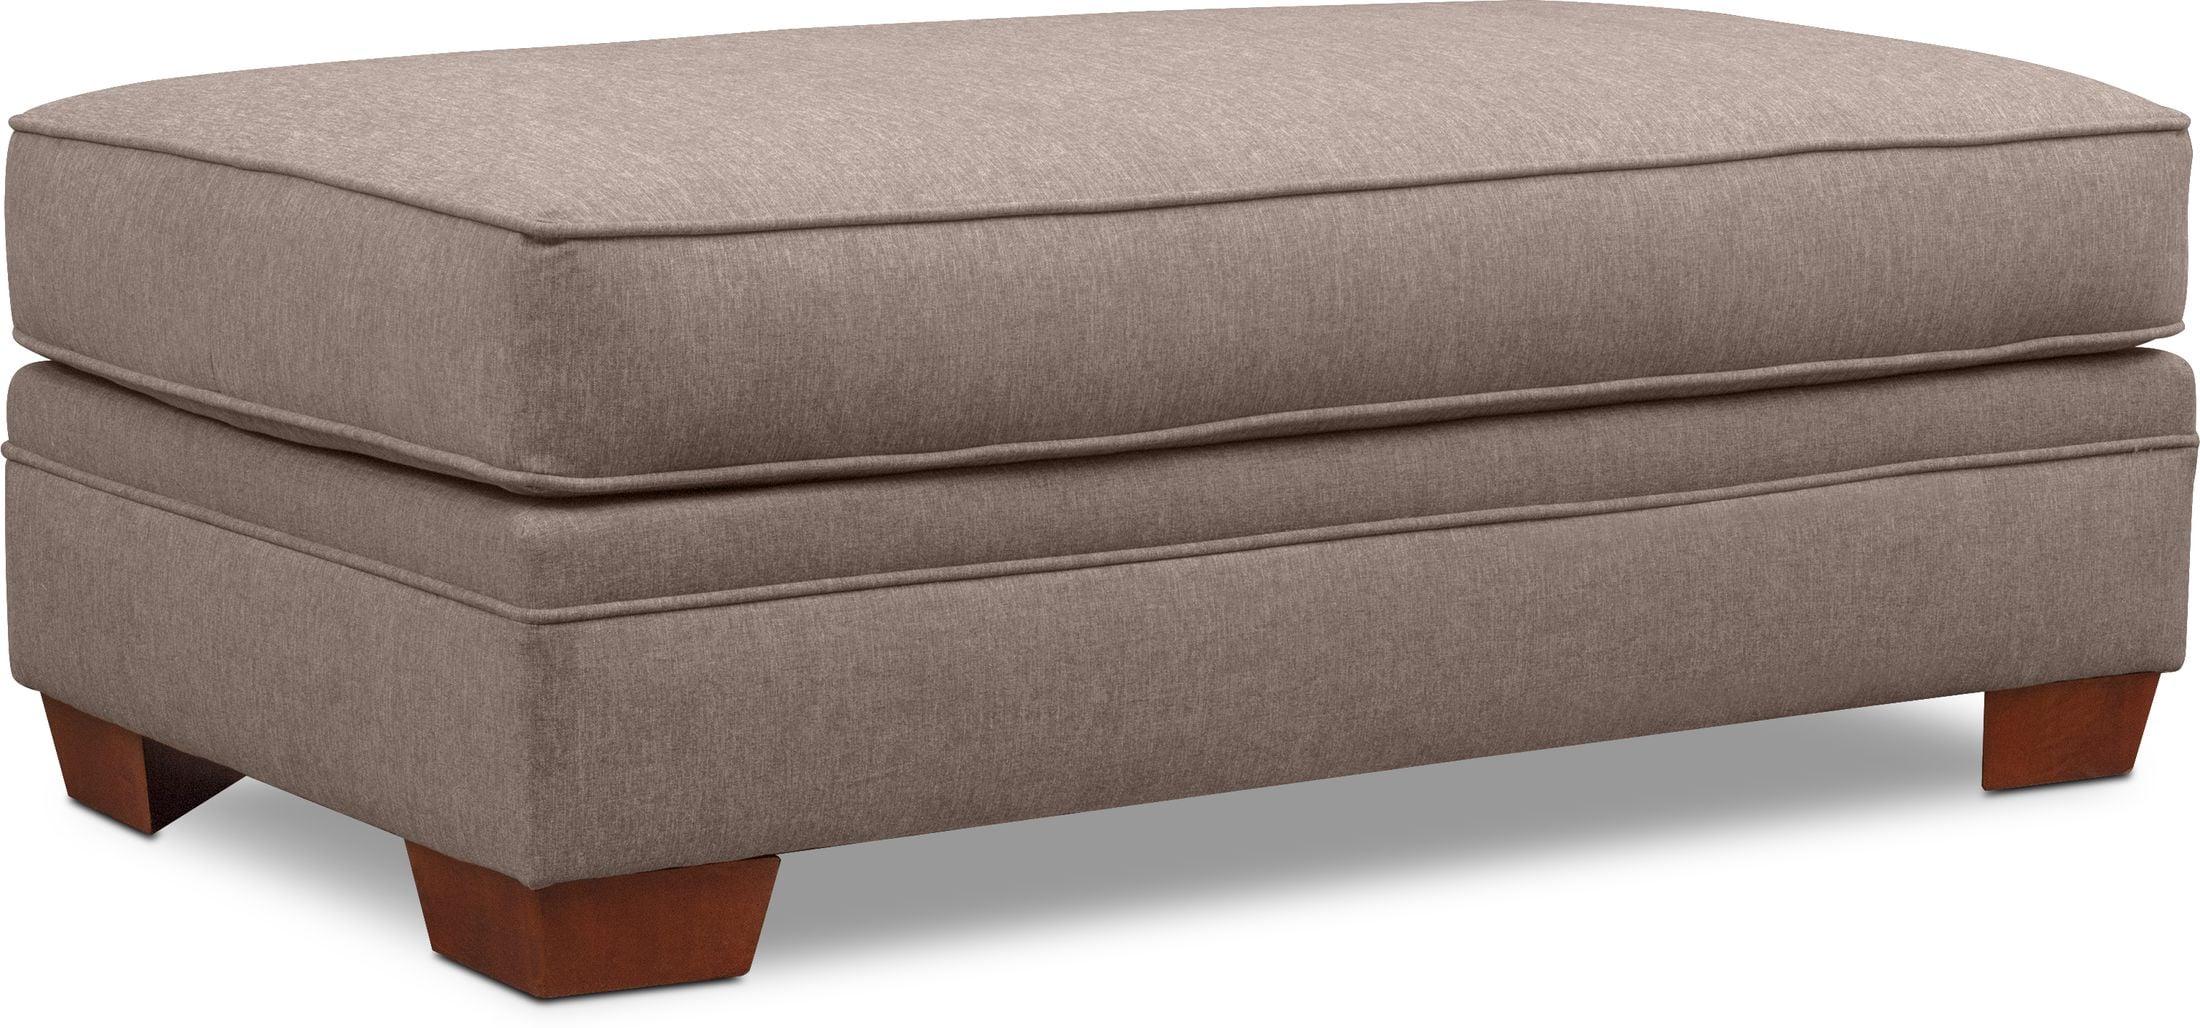 Living Room Furniture - Rowan Ottoman